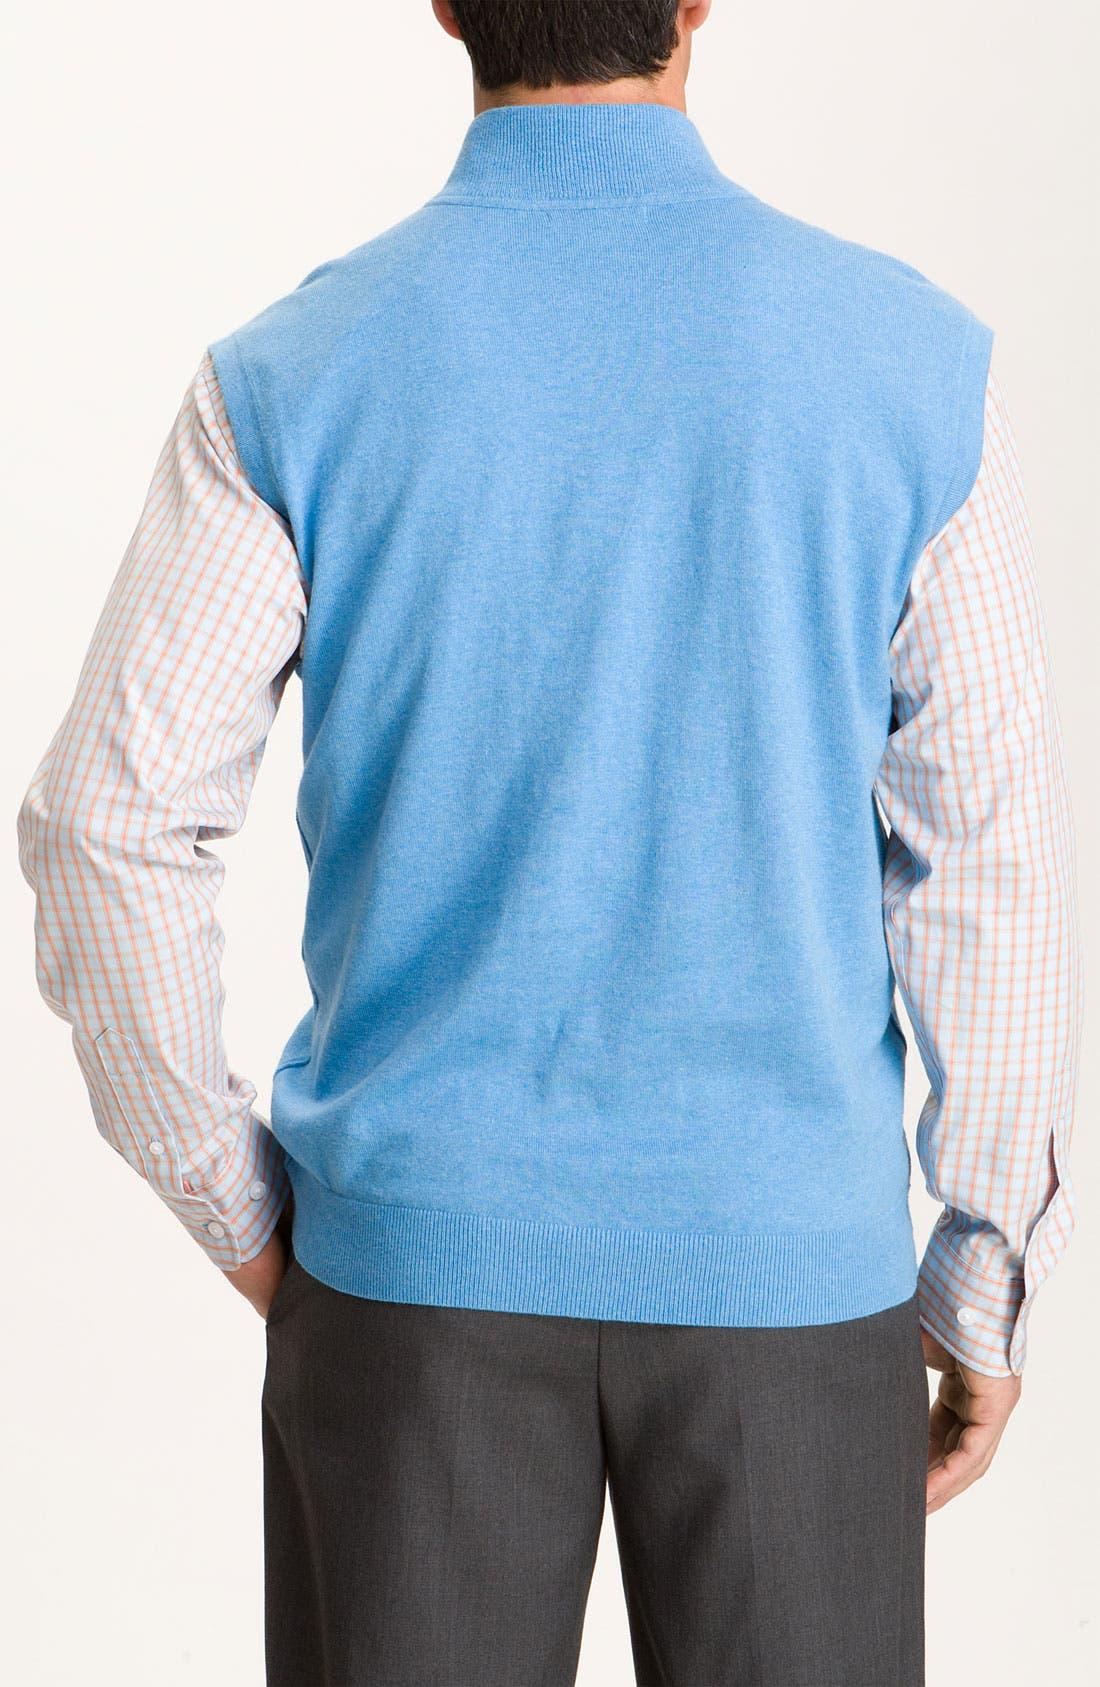 Alternate Image 2  - Cutter & Buck 'Thomas' Half Zip Vest (Big & Tall) (Online Exclusive)